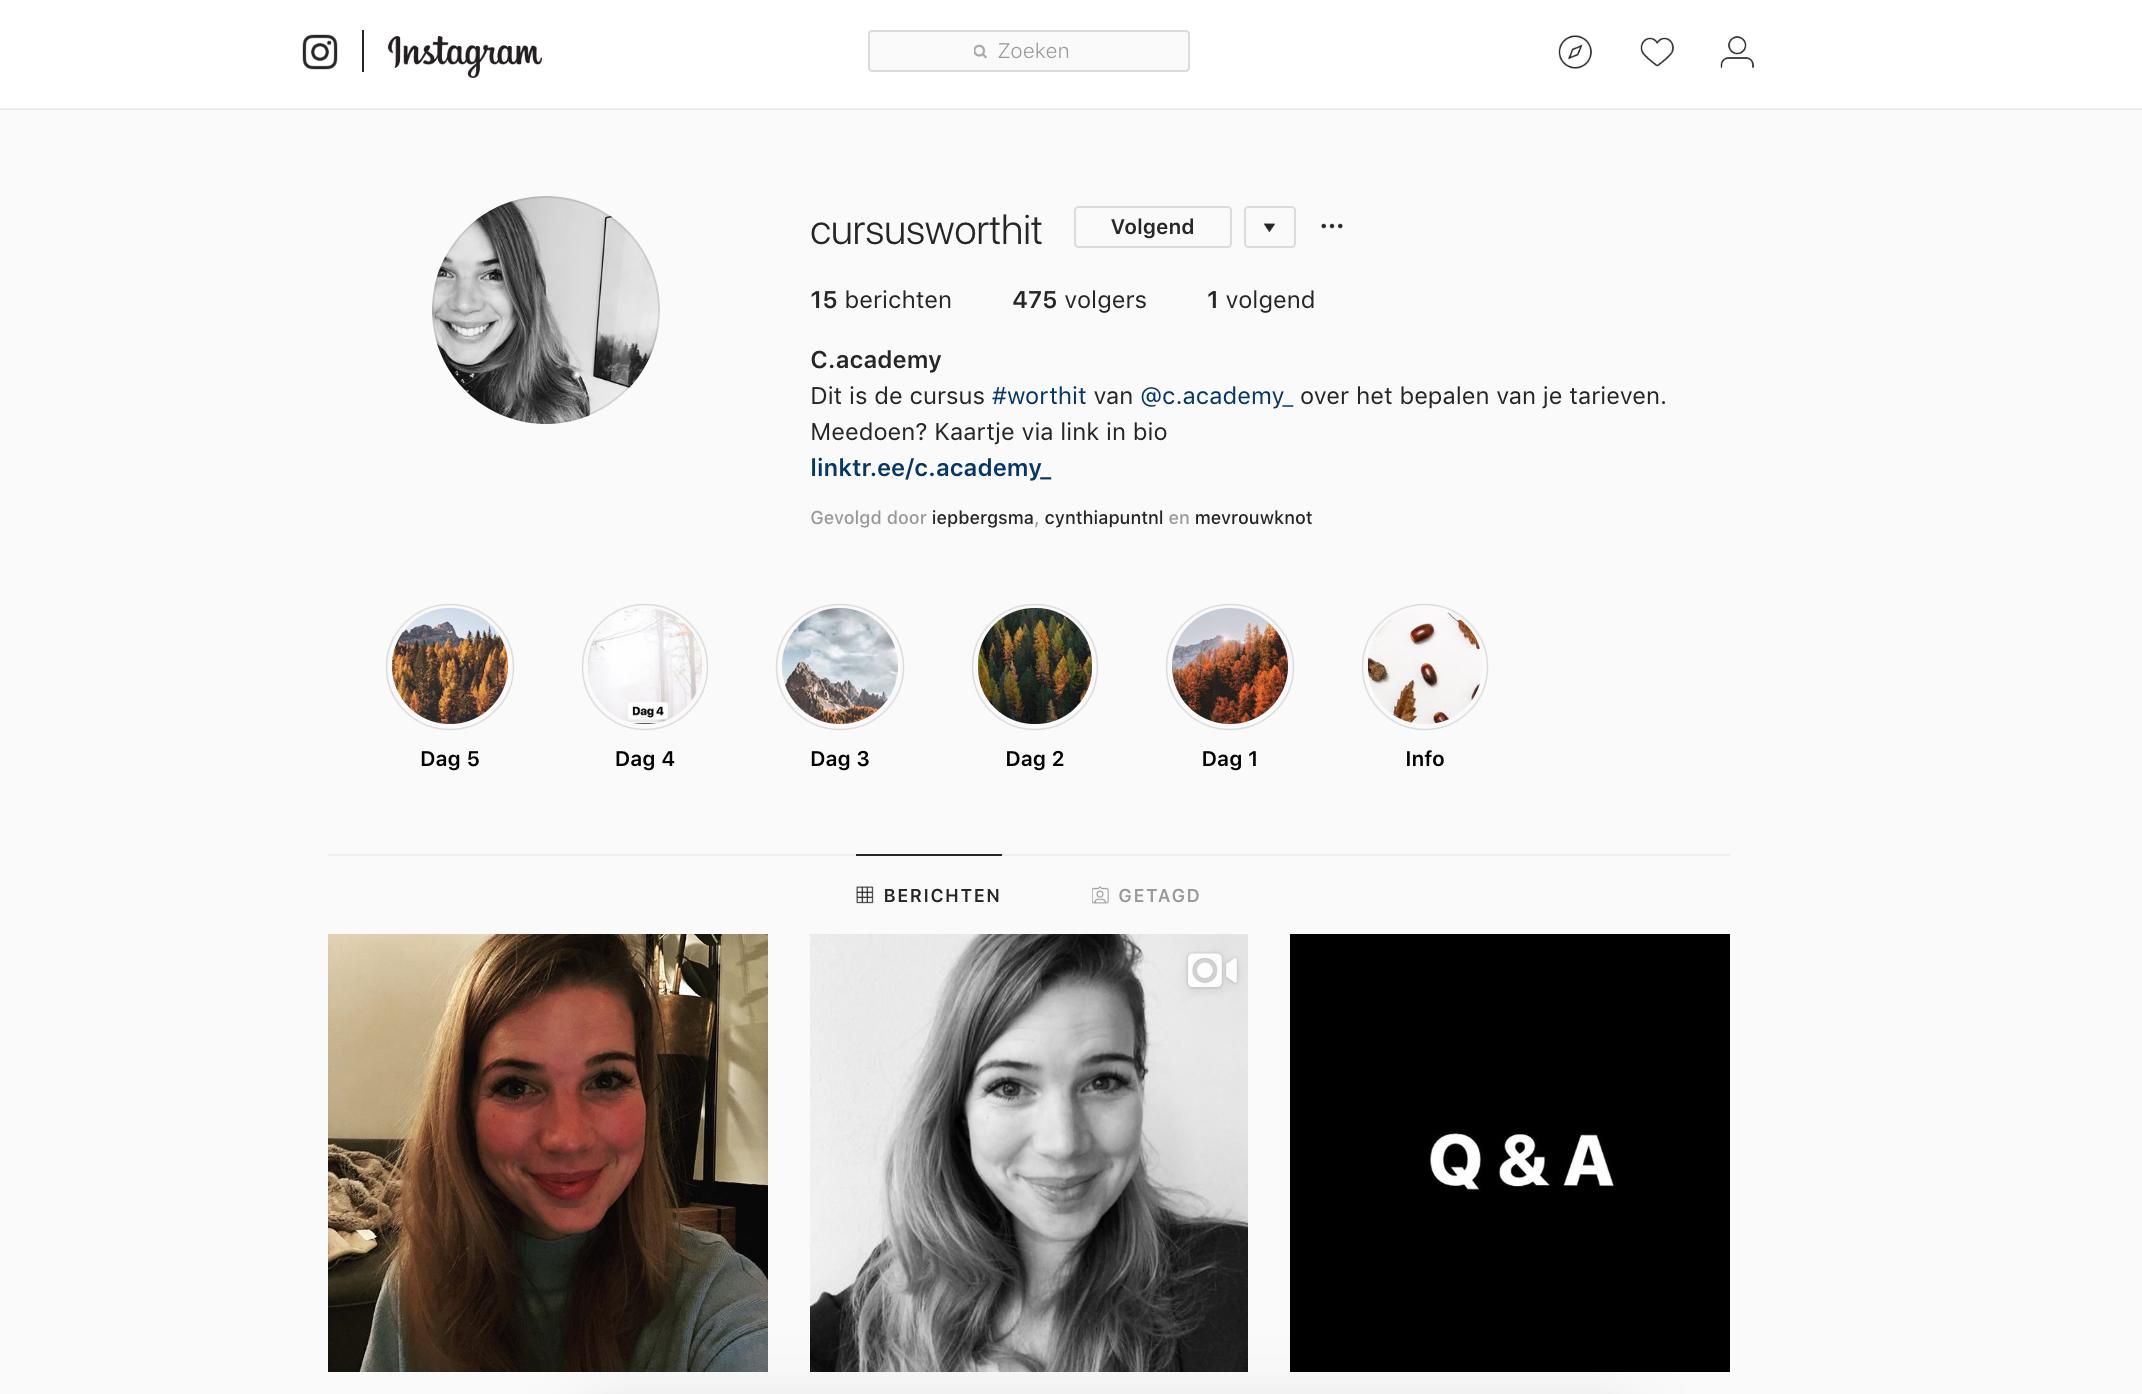 Instagramcursus tarieven bepalen #worthit Charlotte van 't Wout